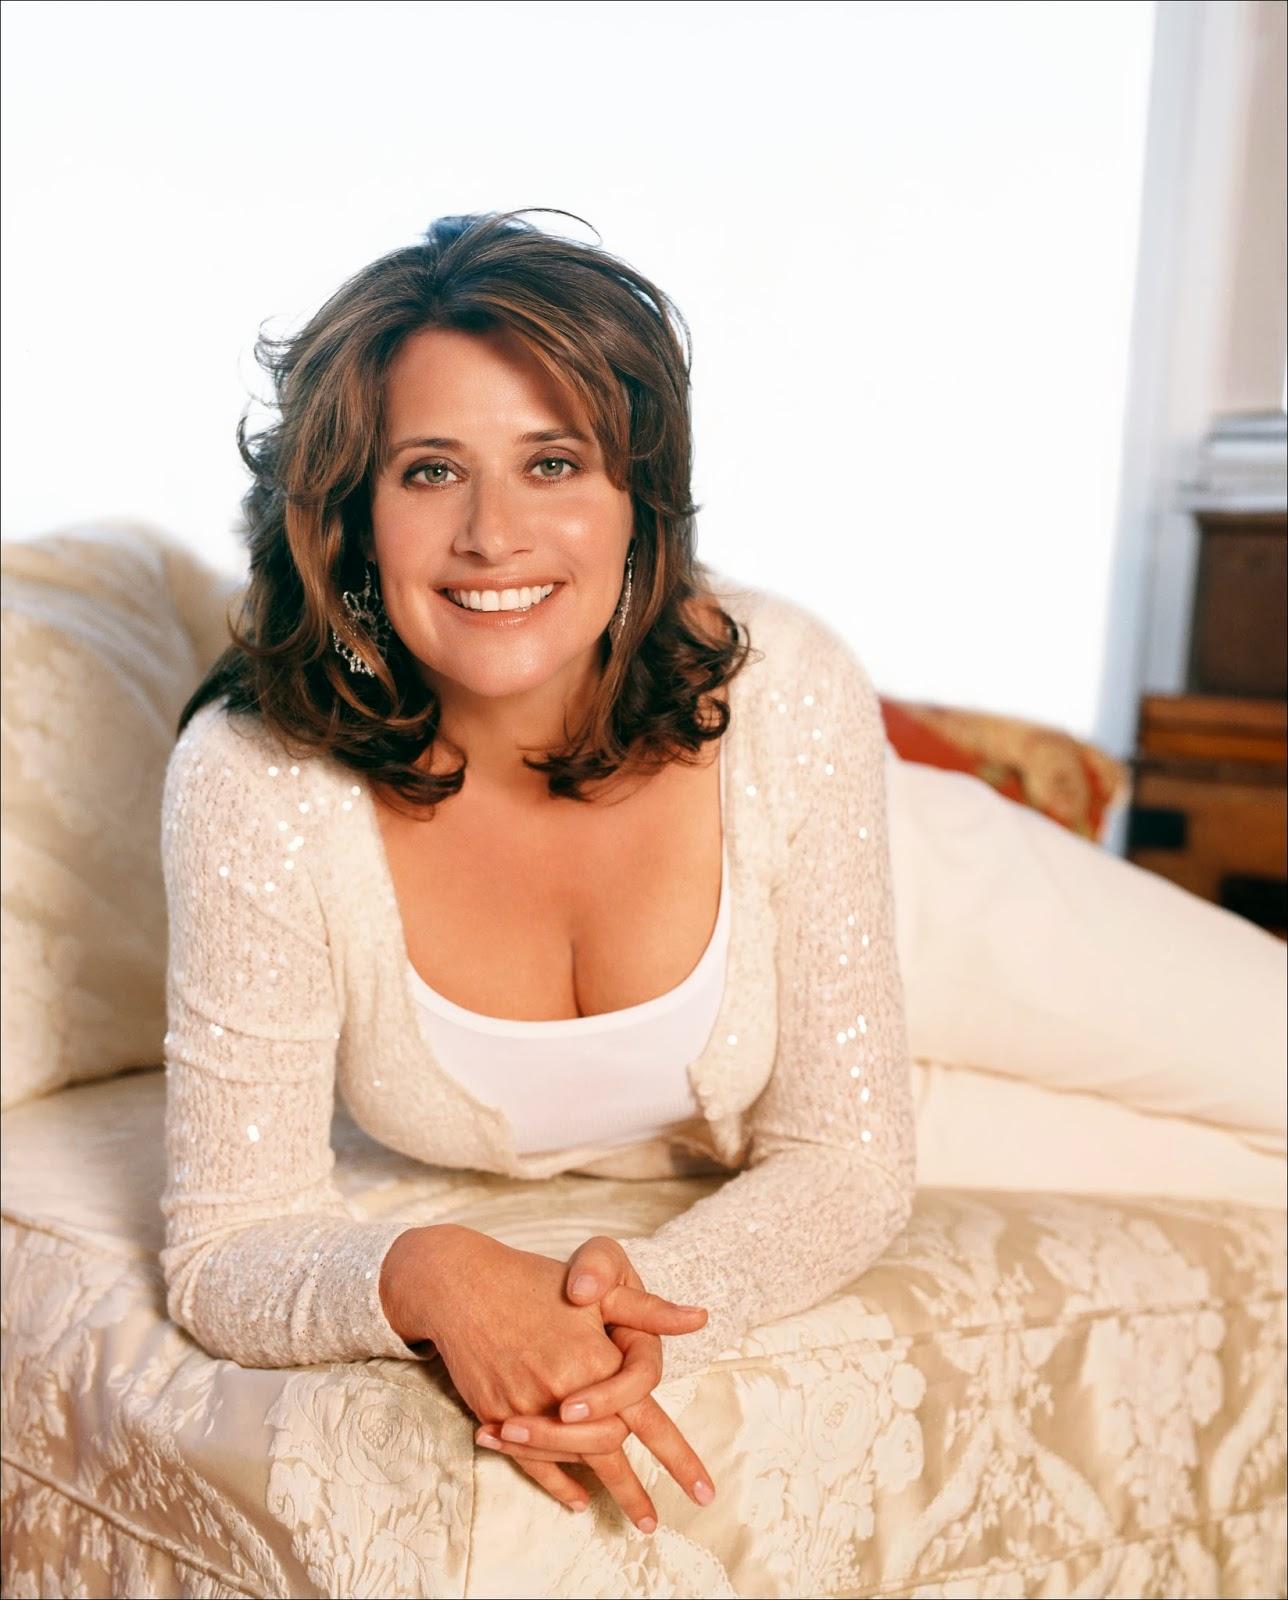 Lorraine bracco sopranos